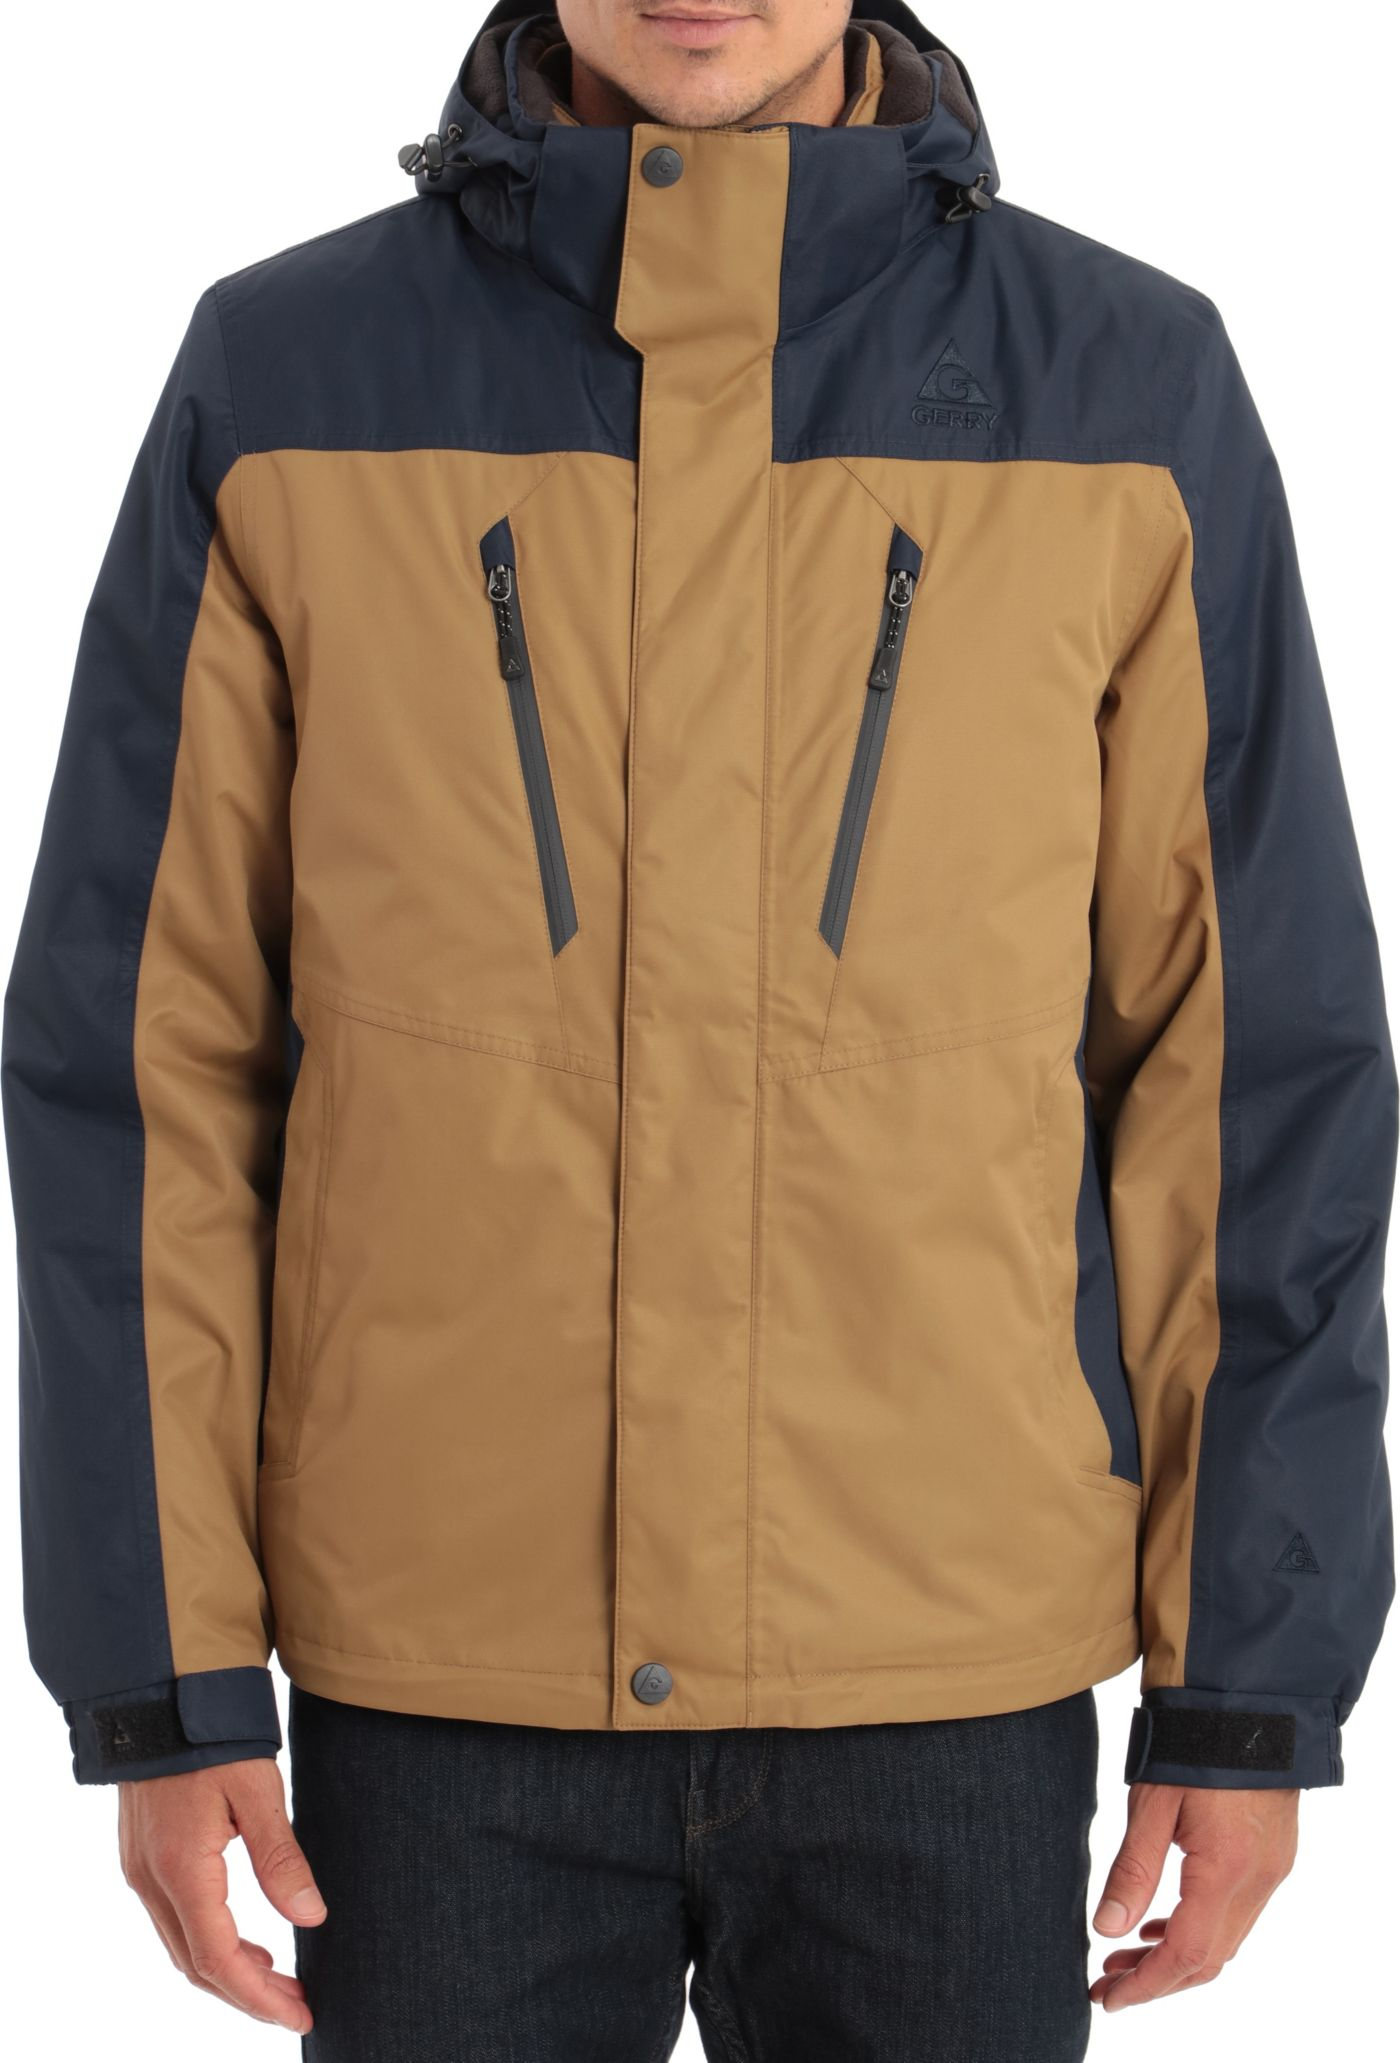 Gerry Men's Crusade System Jacket